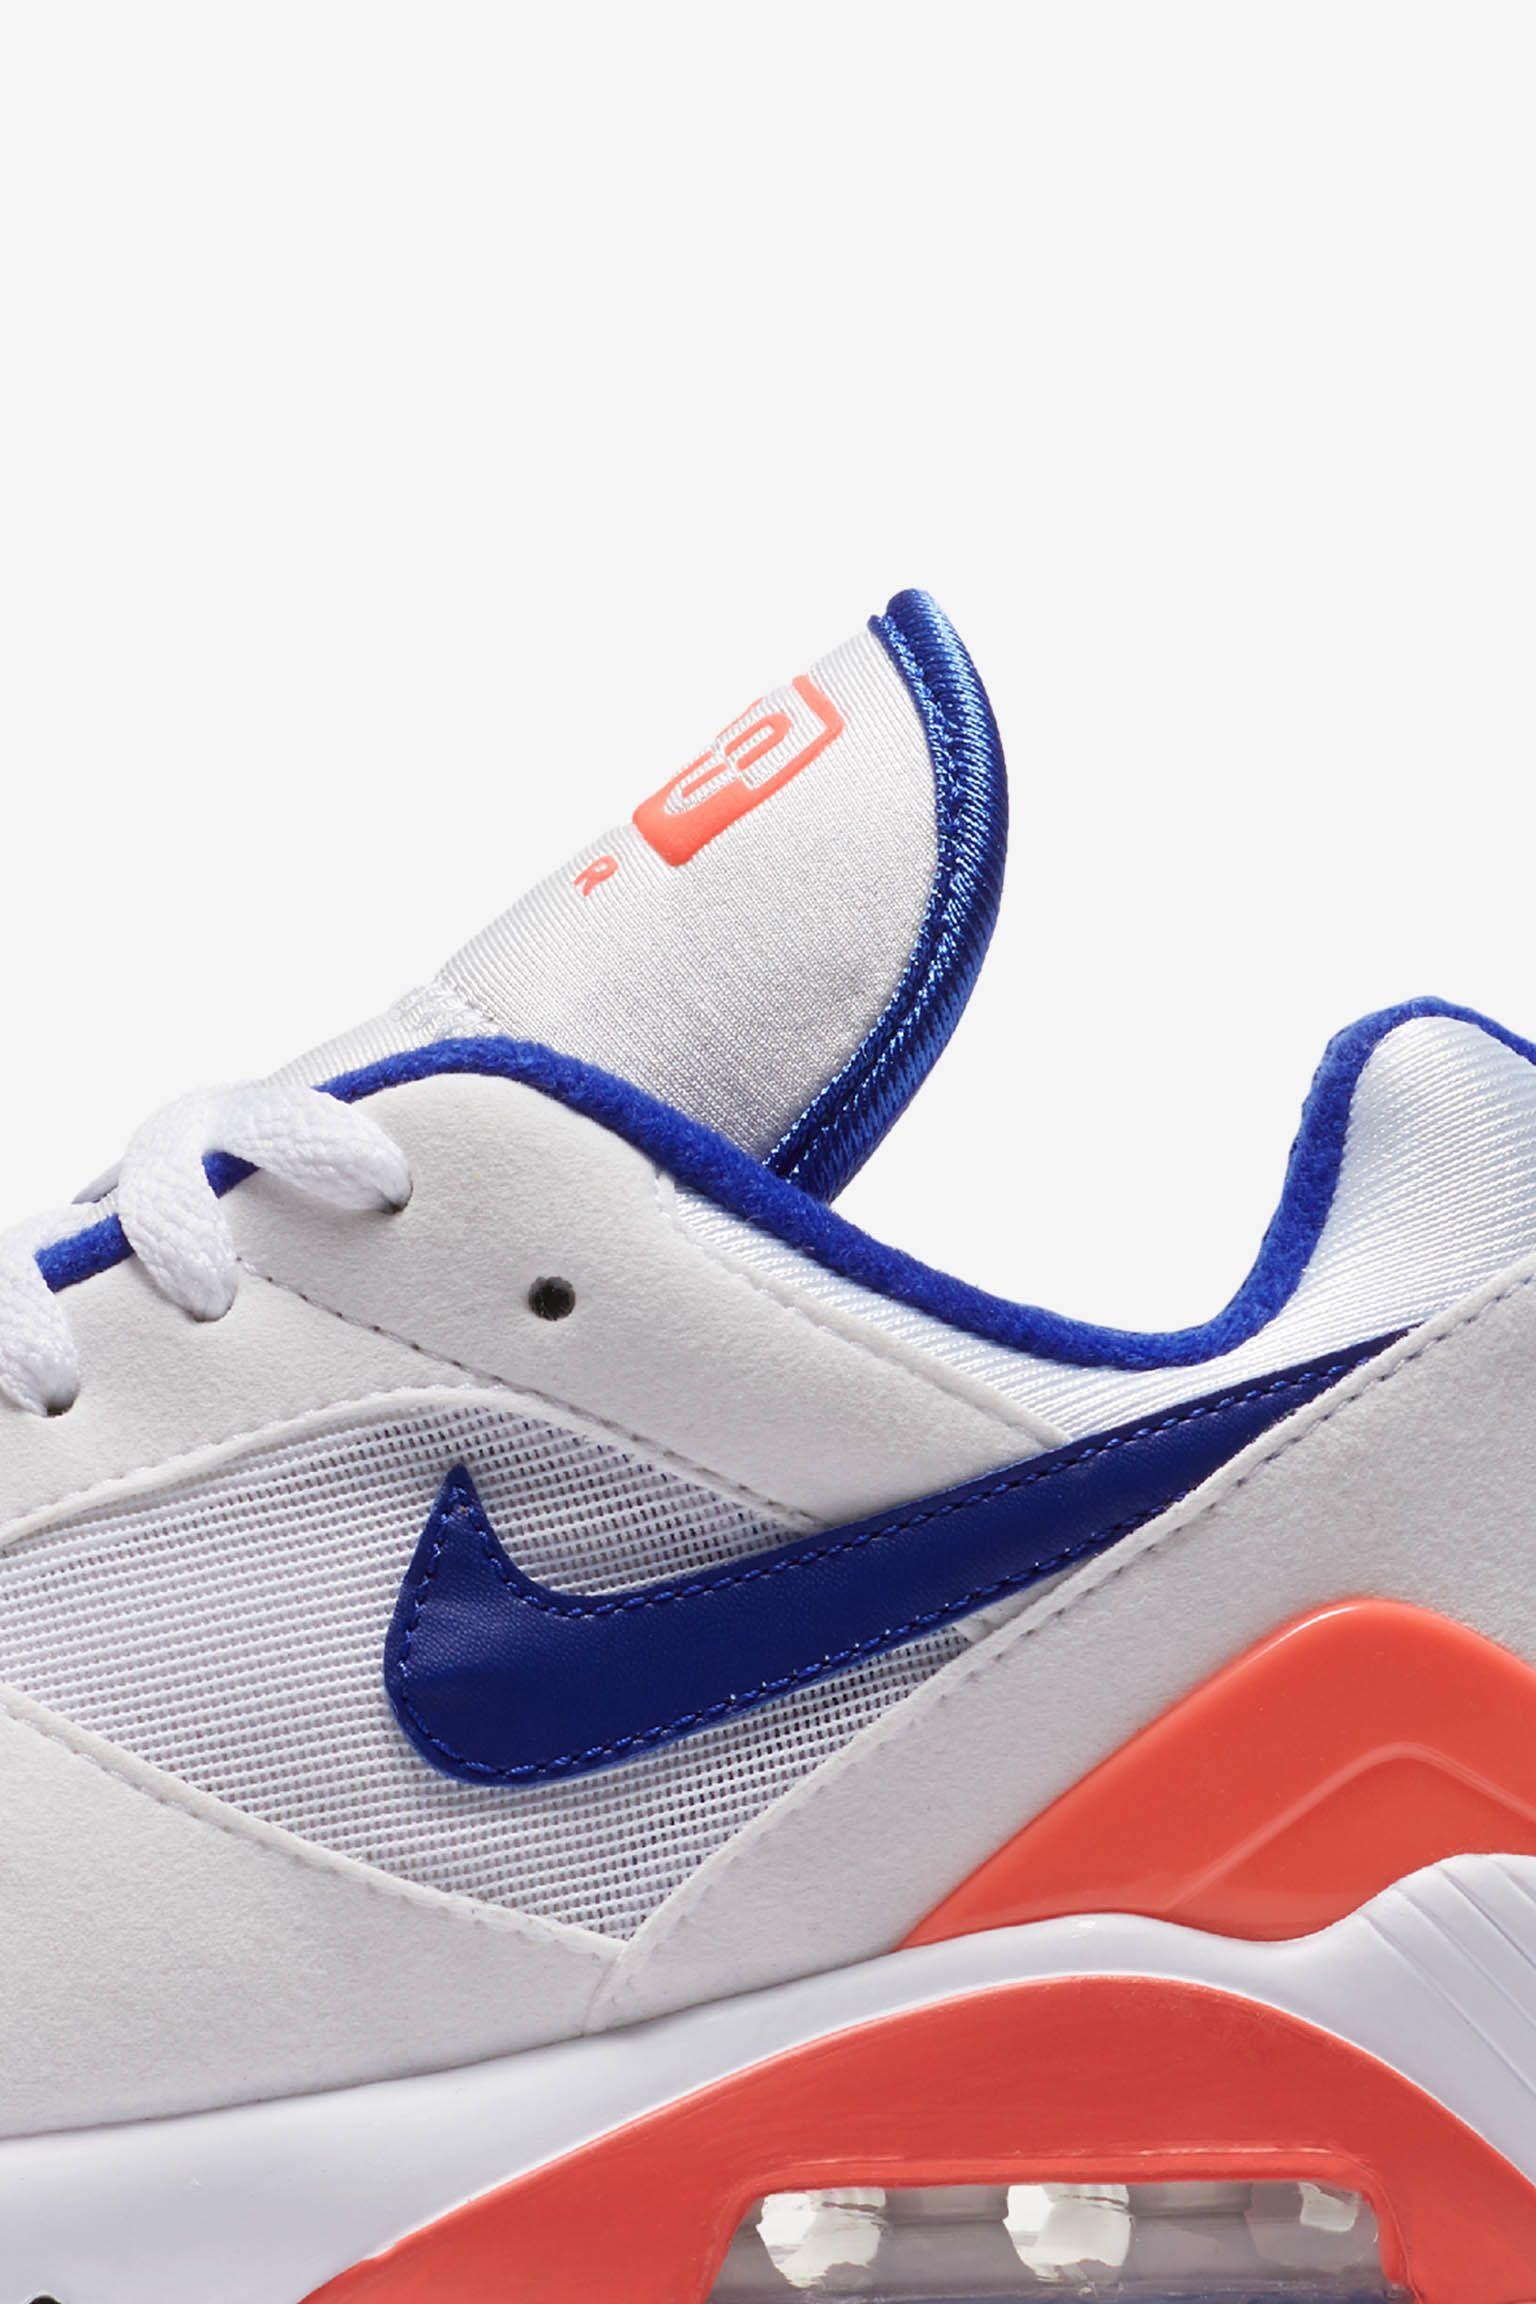 Nike Women's Air Max 180 'White & Solar Red & Racer Blue' Release ...